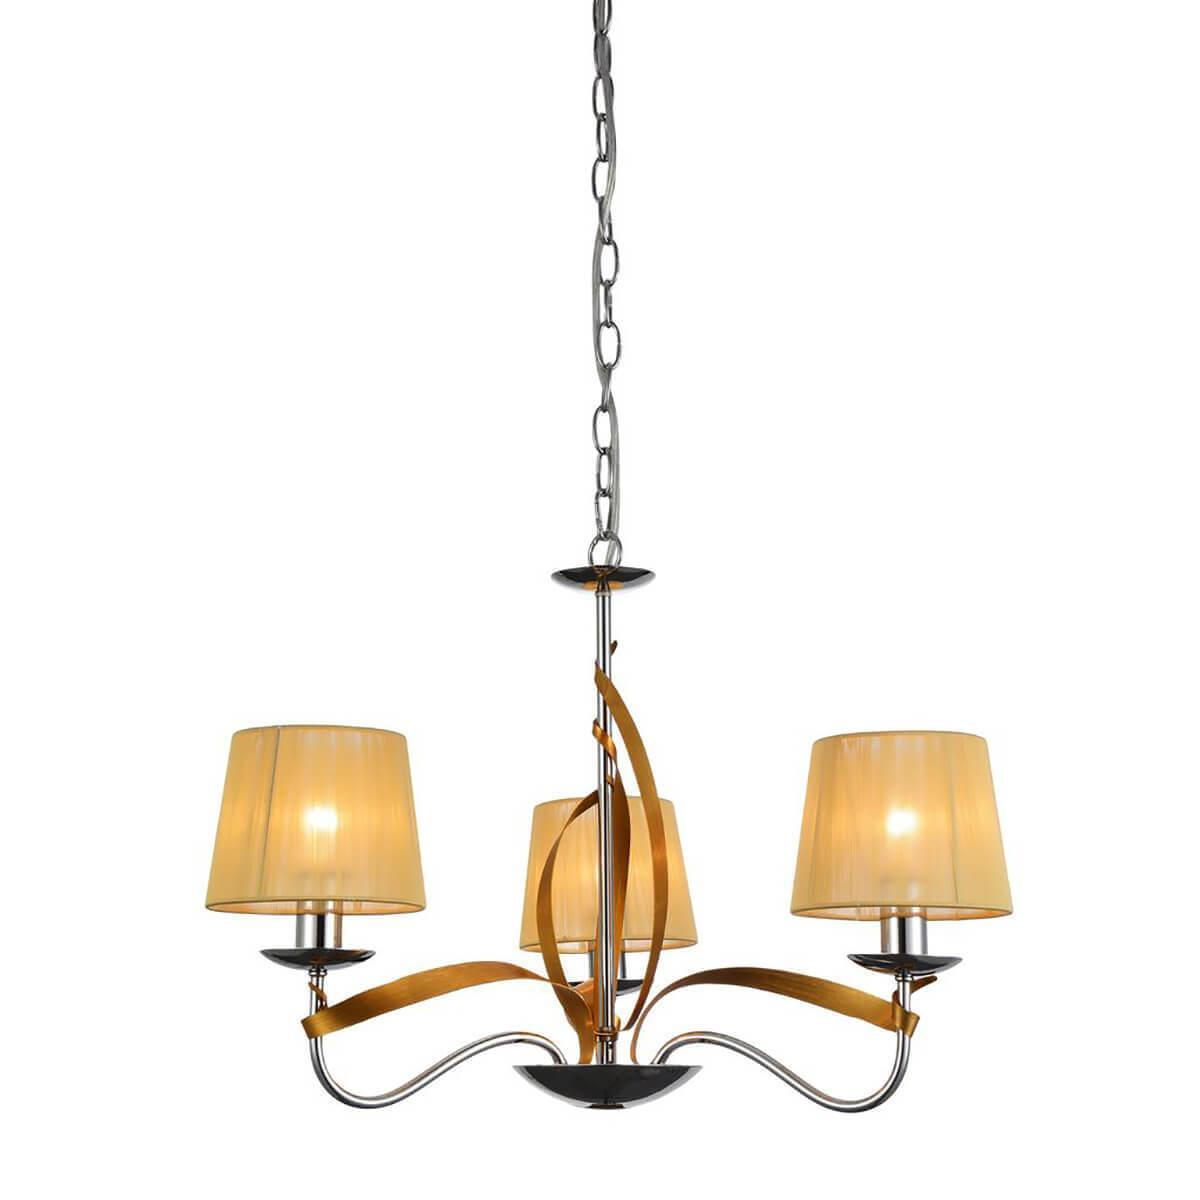 Подвесной светильник Omnilux OML-61603-03, E14, 40 Вт